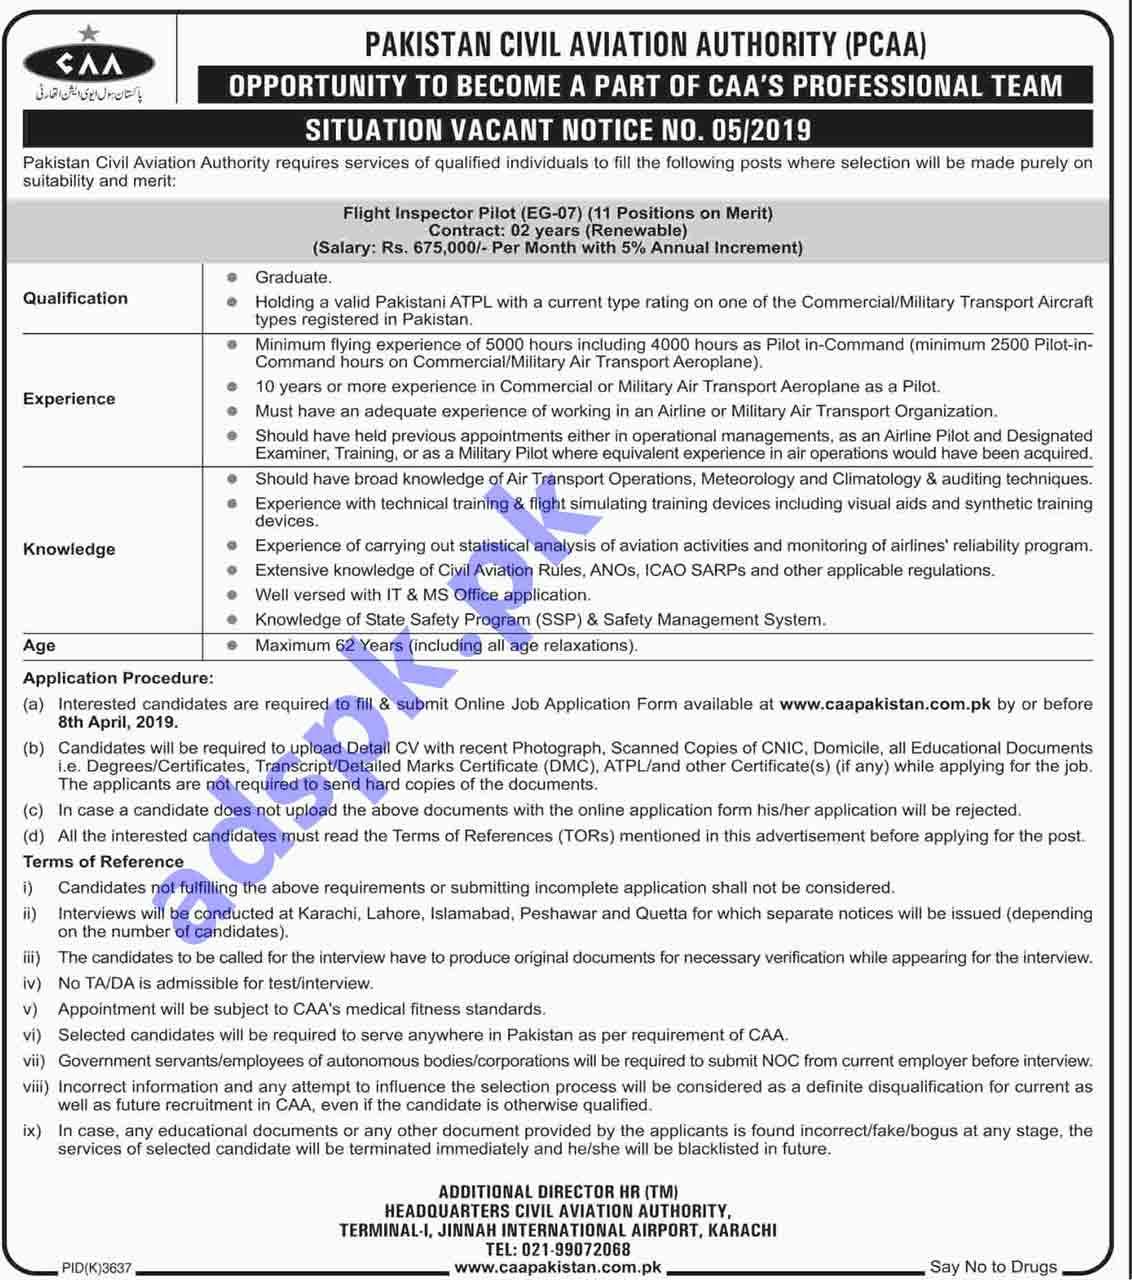 Pakistan Civil Aviation Authority PCAA Karachi Jobs 2019 for Flight Inspector Pilot 11 Posts Jobs Application Form Deadline 08-04-2019 Apply Online Now